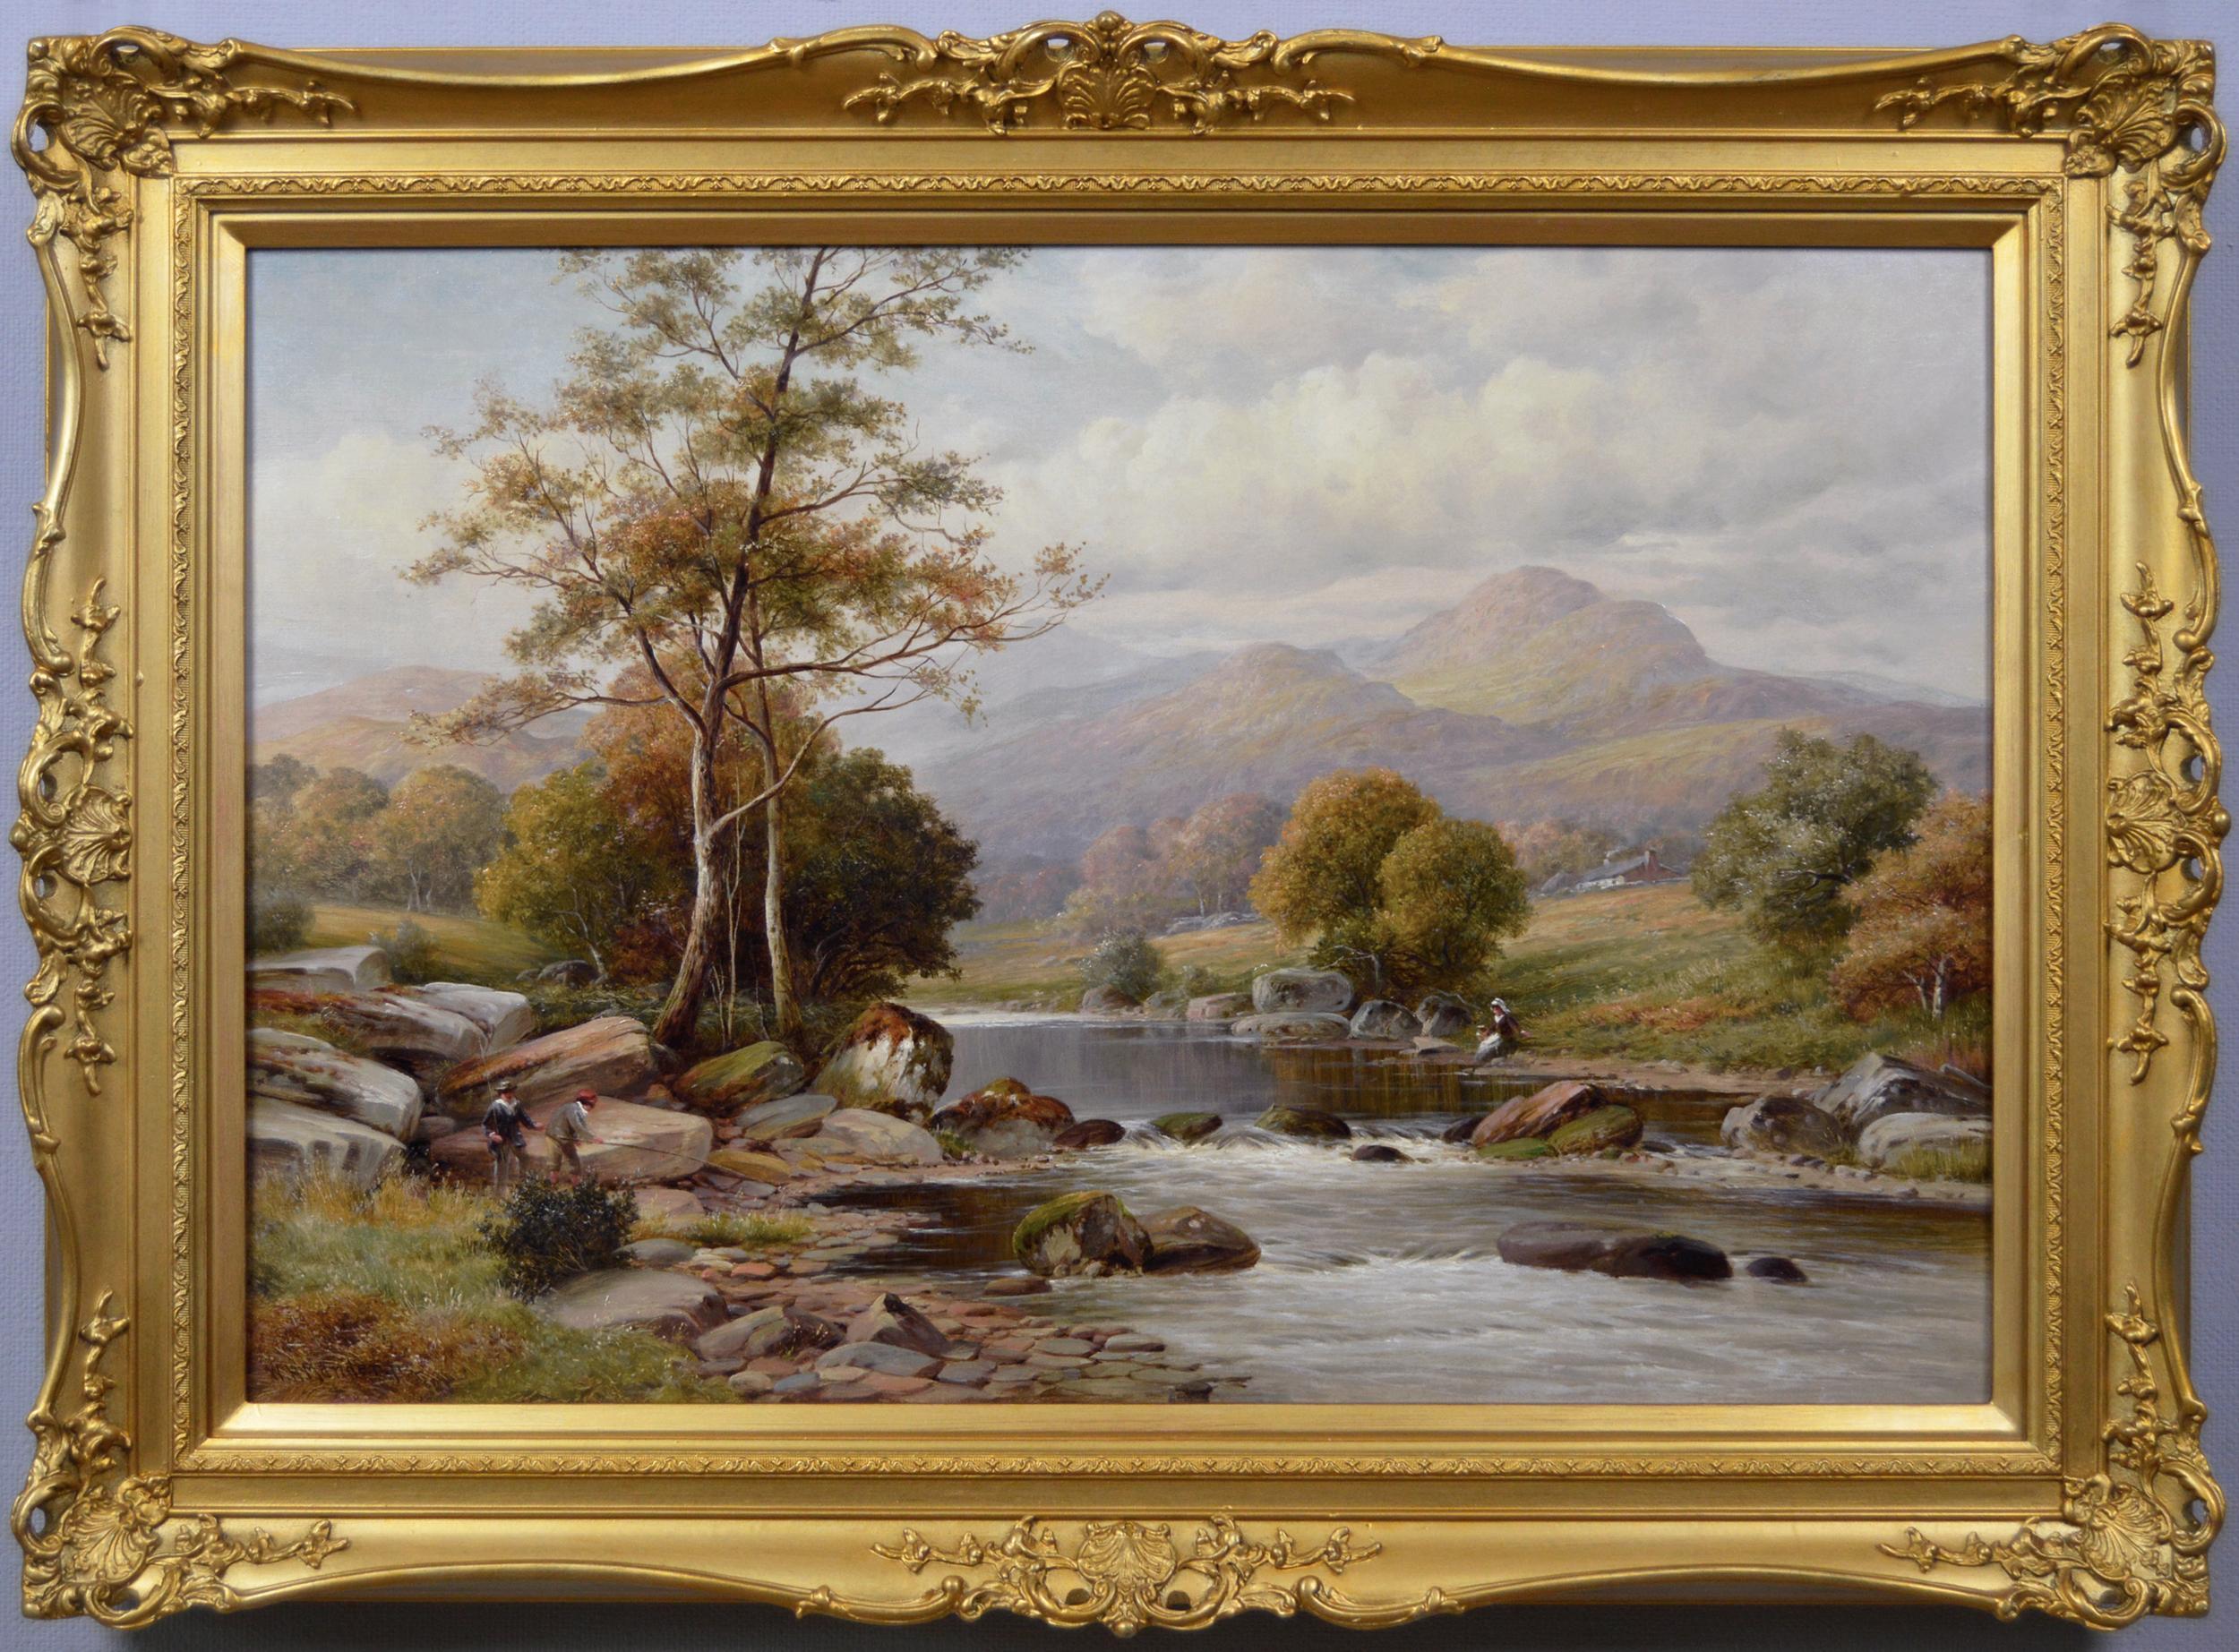 19th Century river landscape oil painting